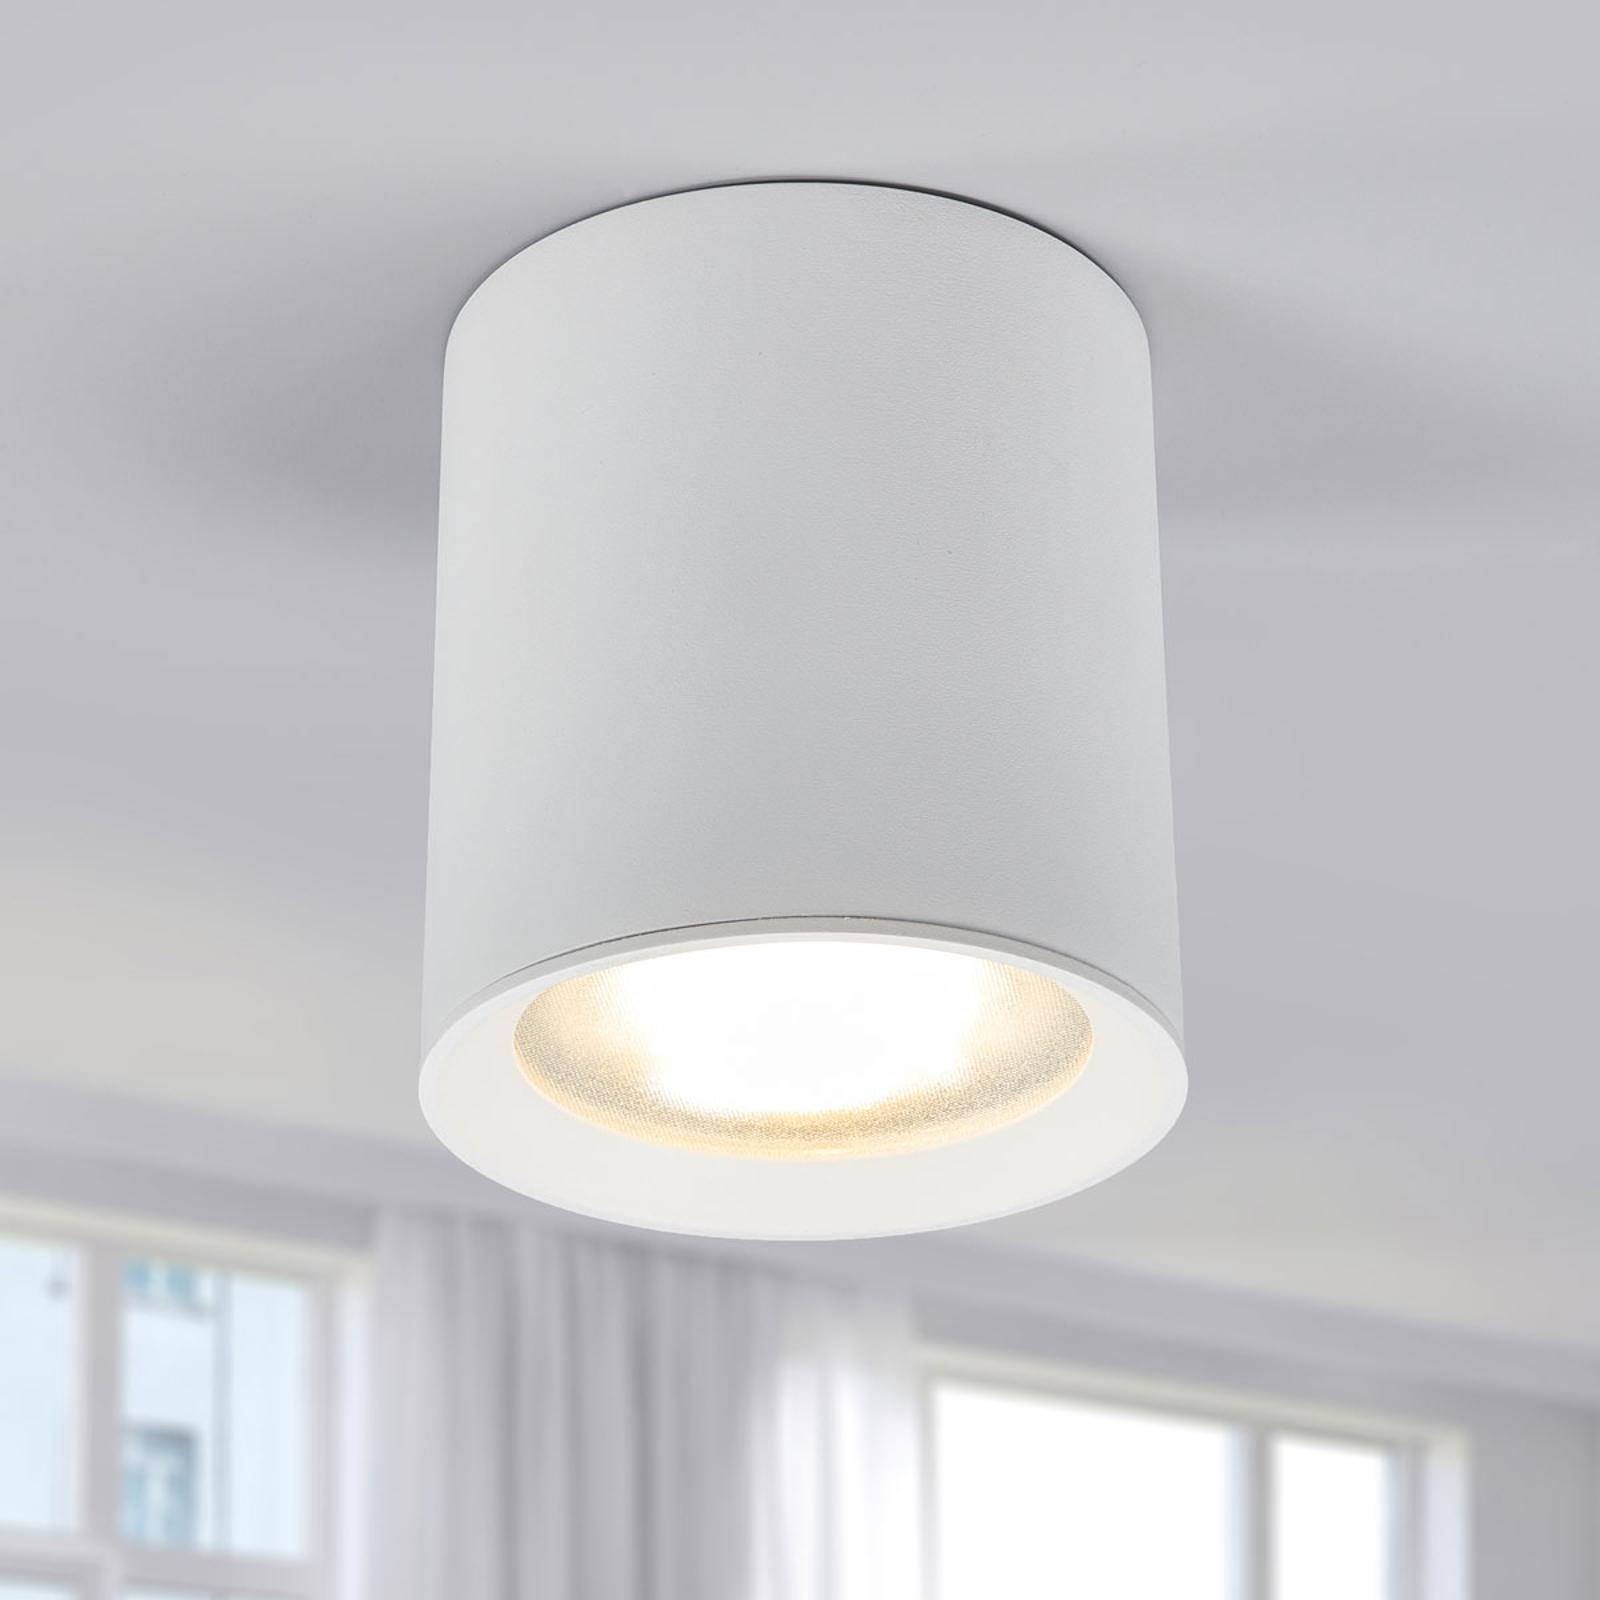 LED-kattovalaisin Benk, 11 cm, 6,7 W